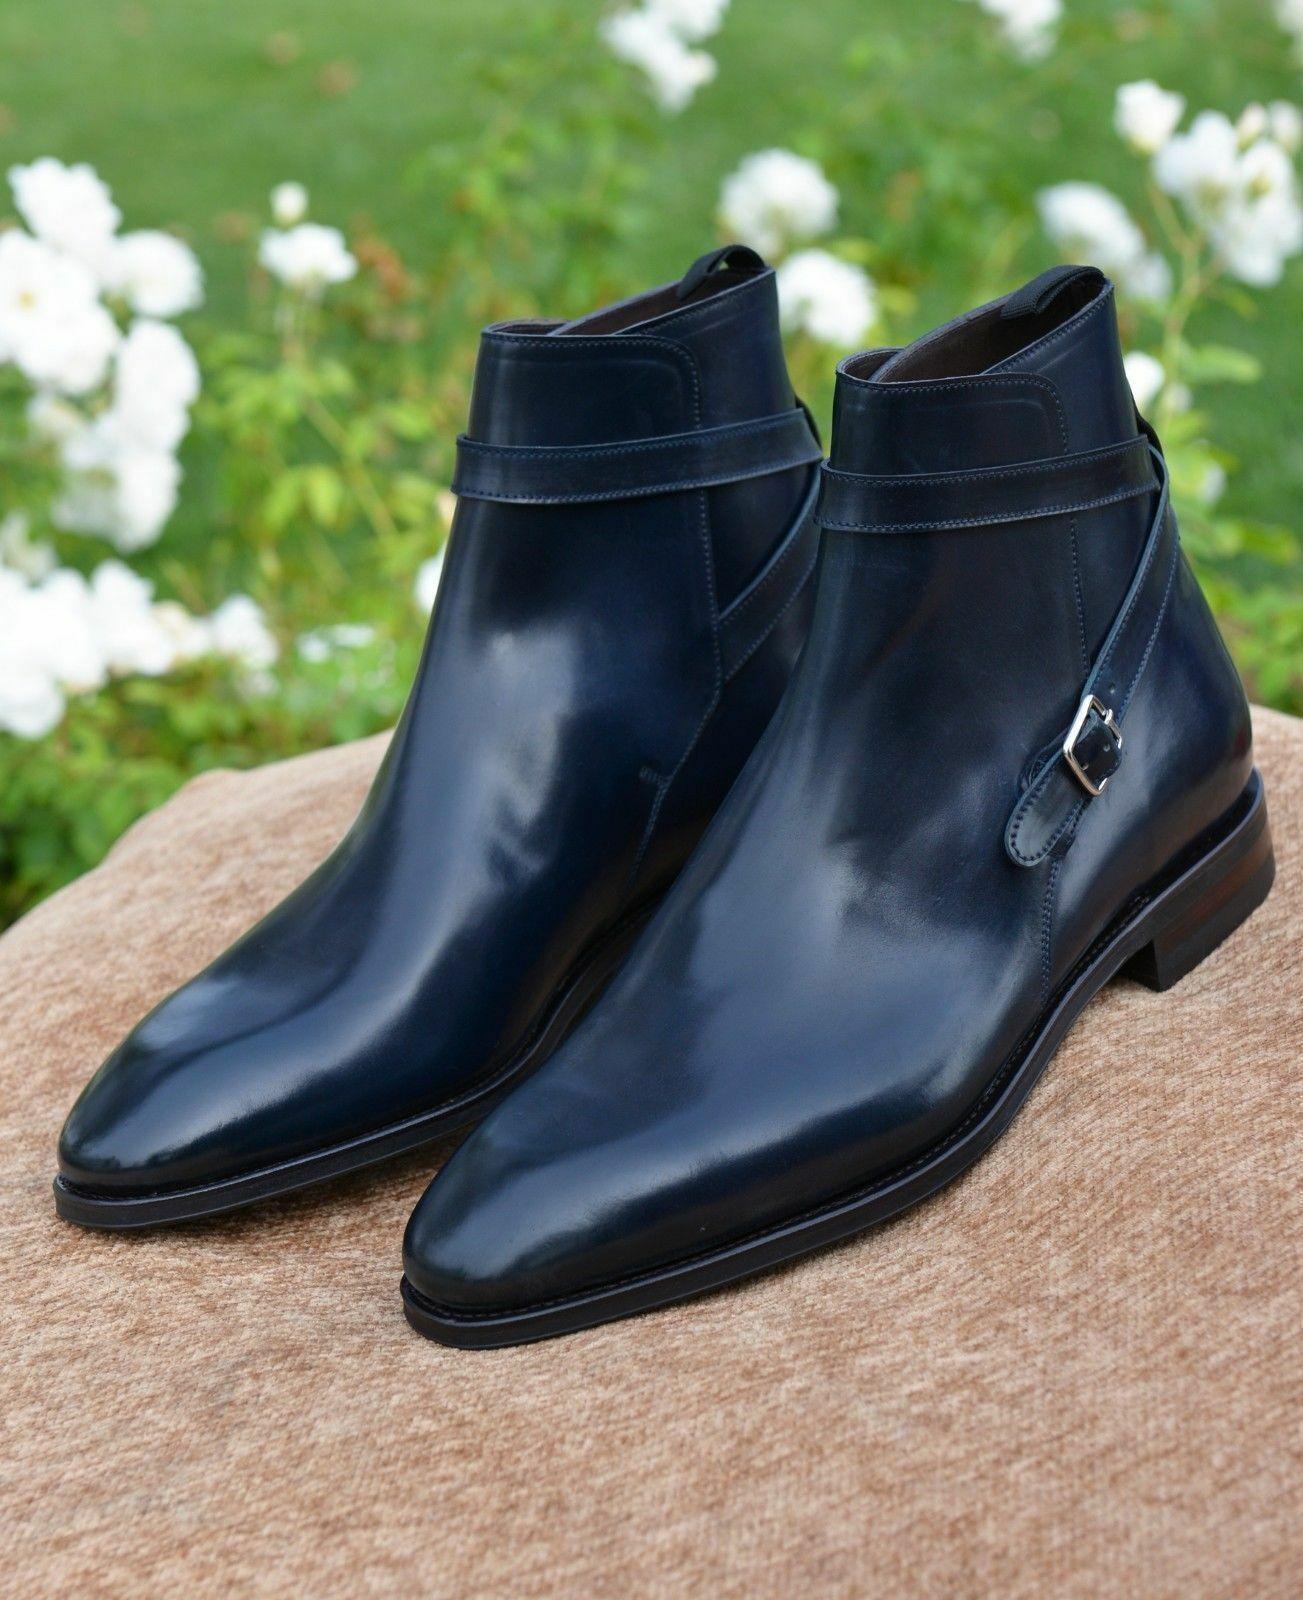 Mens Handmade Boots Jodhpurs Navy bluee Leather Formal Dress Casual Wear shoes New